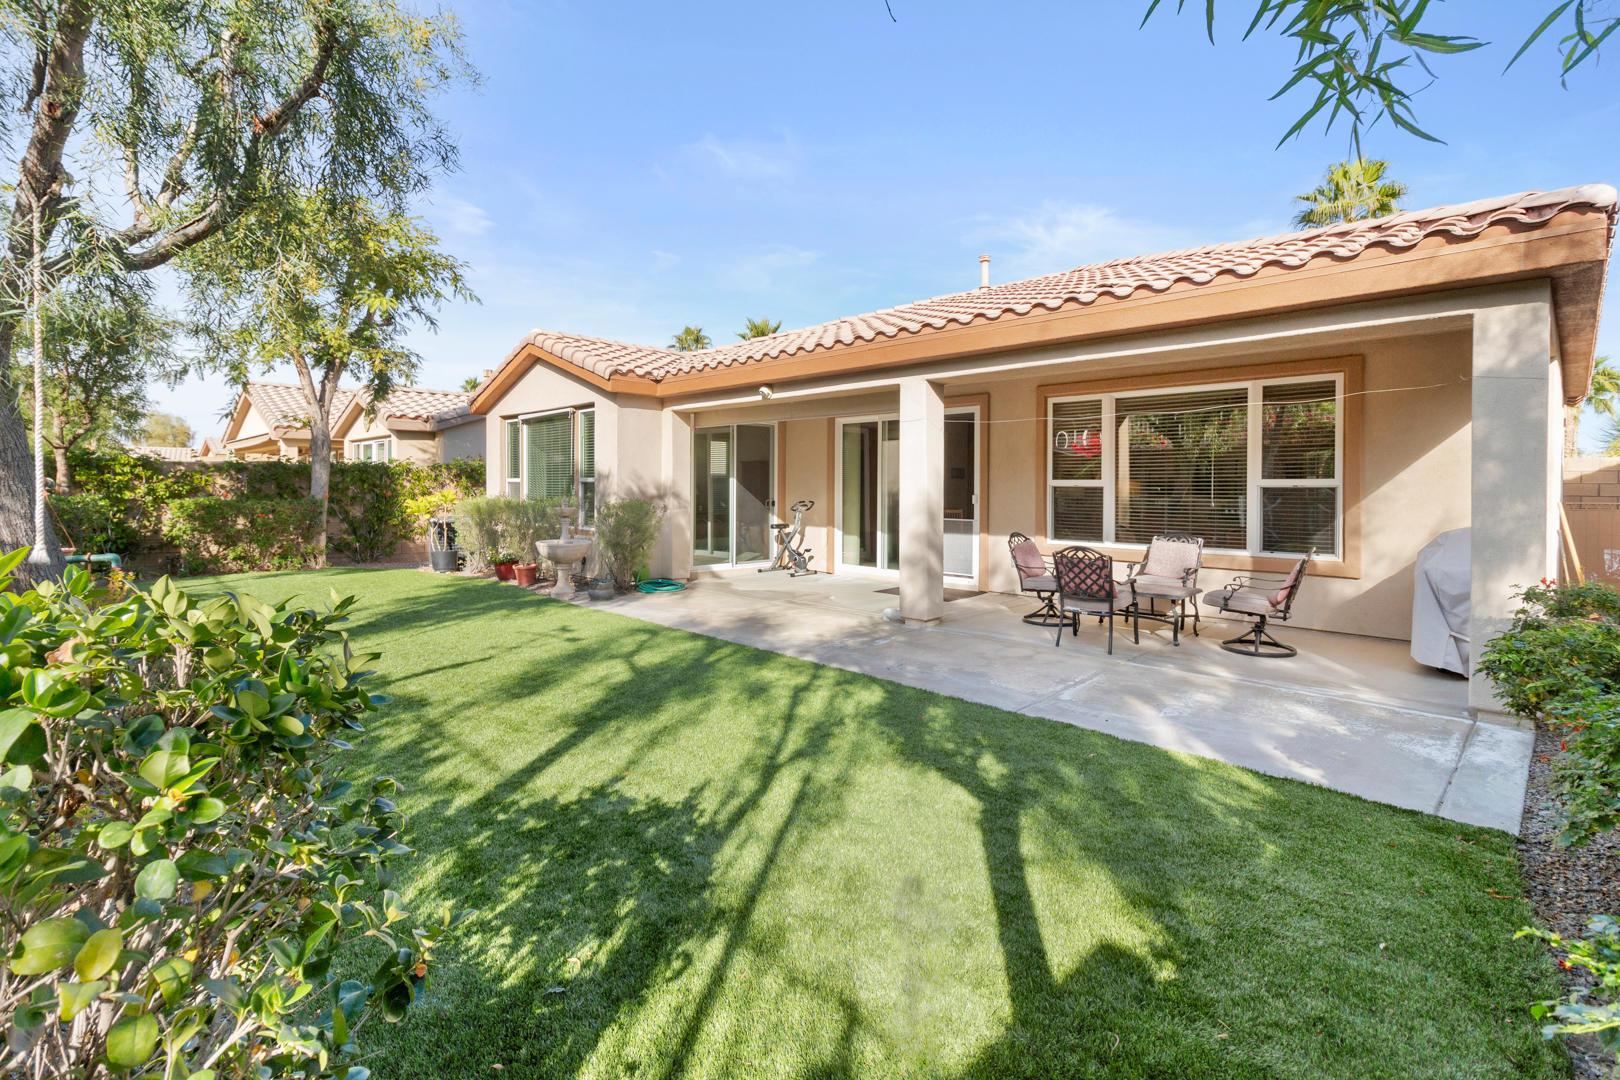 Photo of 60715 Living Stone Drive, La Quinta, CA 92253